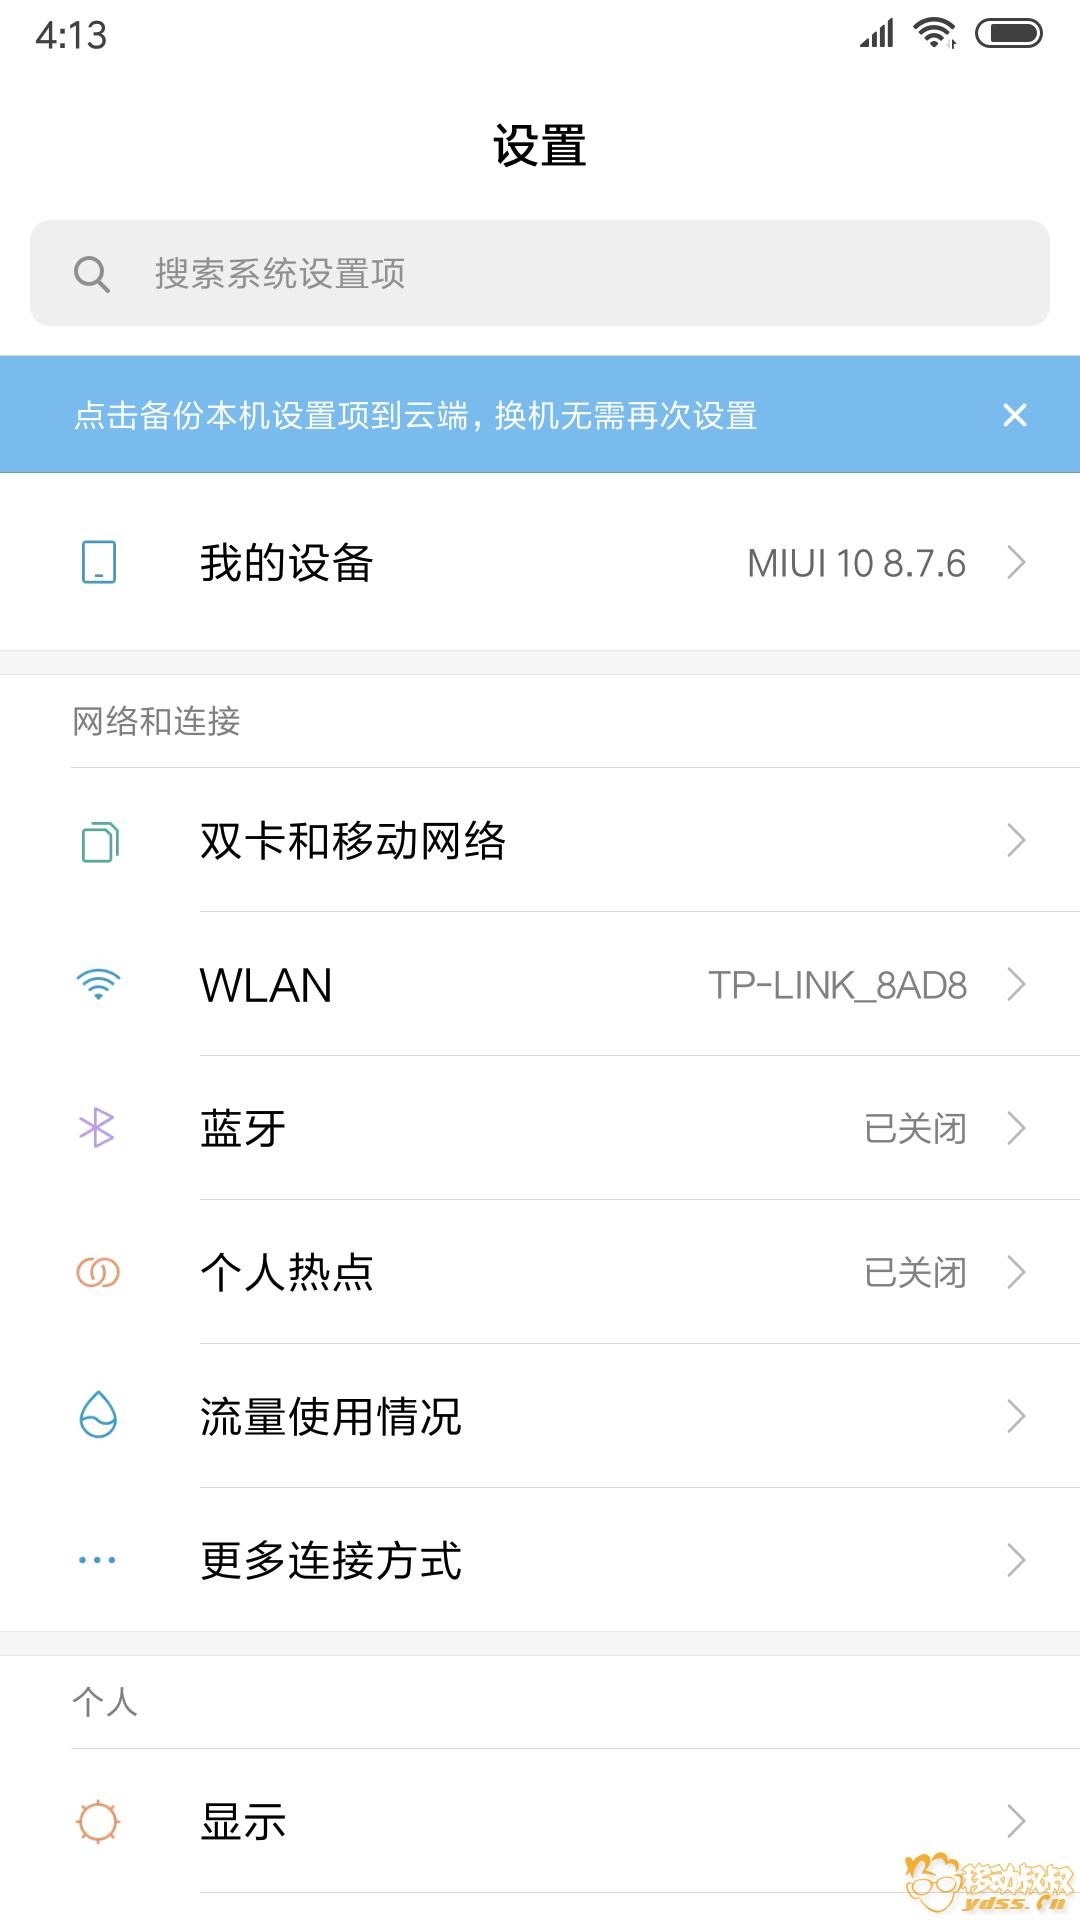 Screenshot_2018-07-06-04-13-11-022_com.android.settings.png